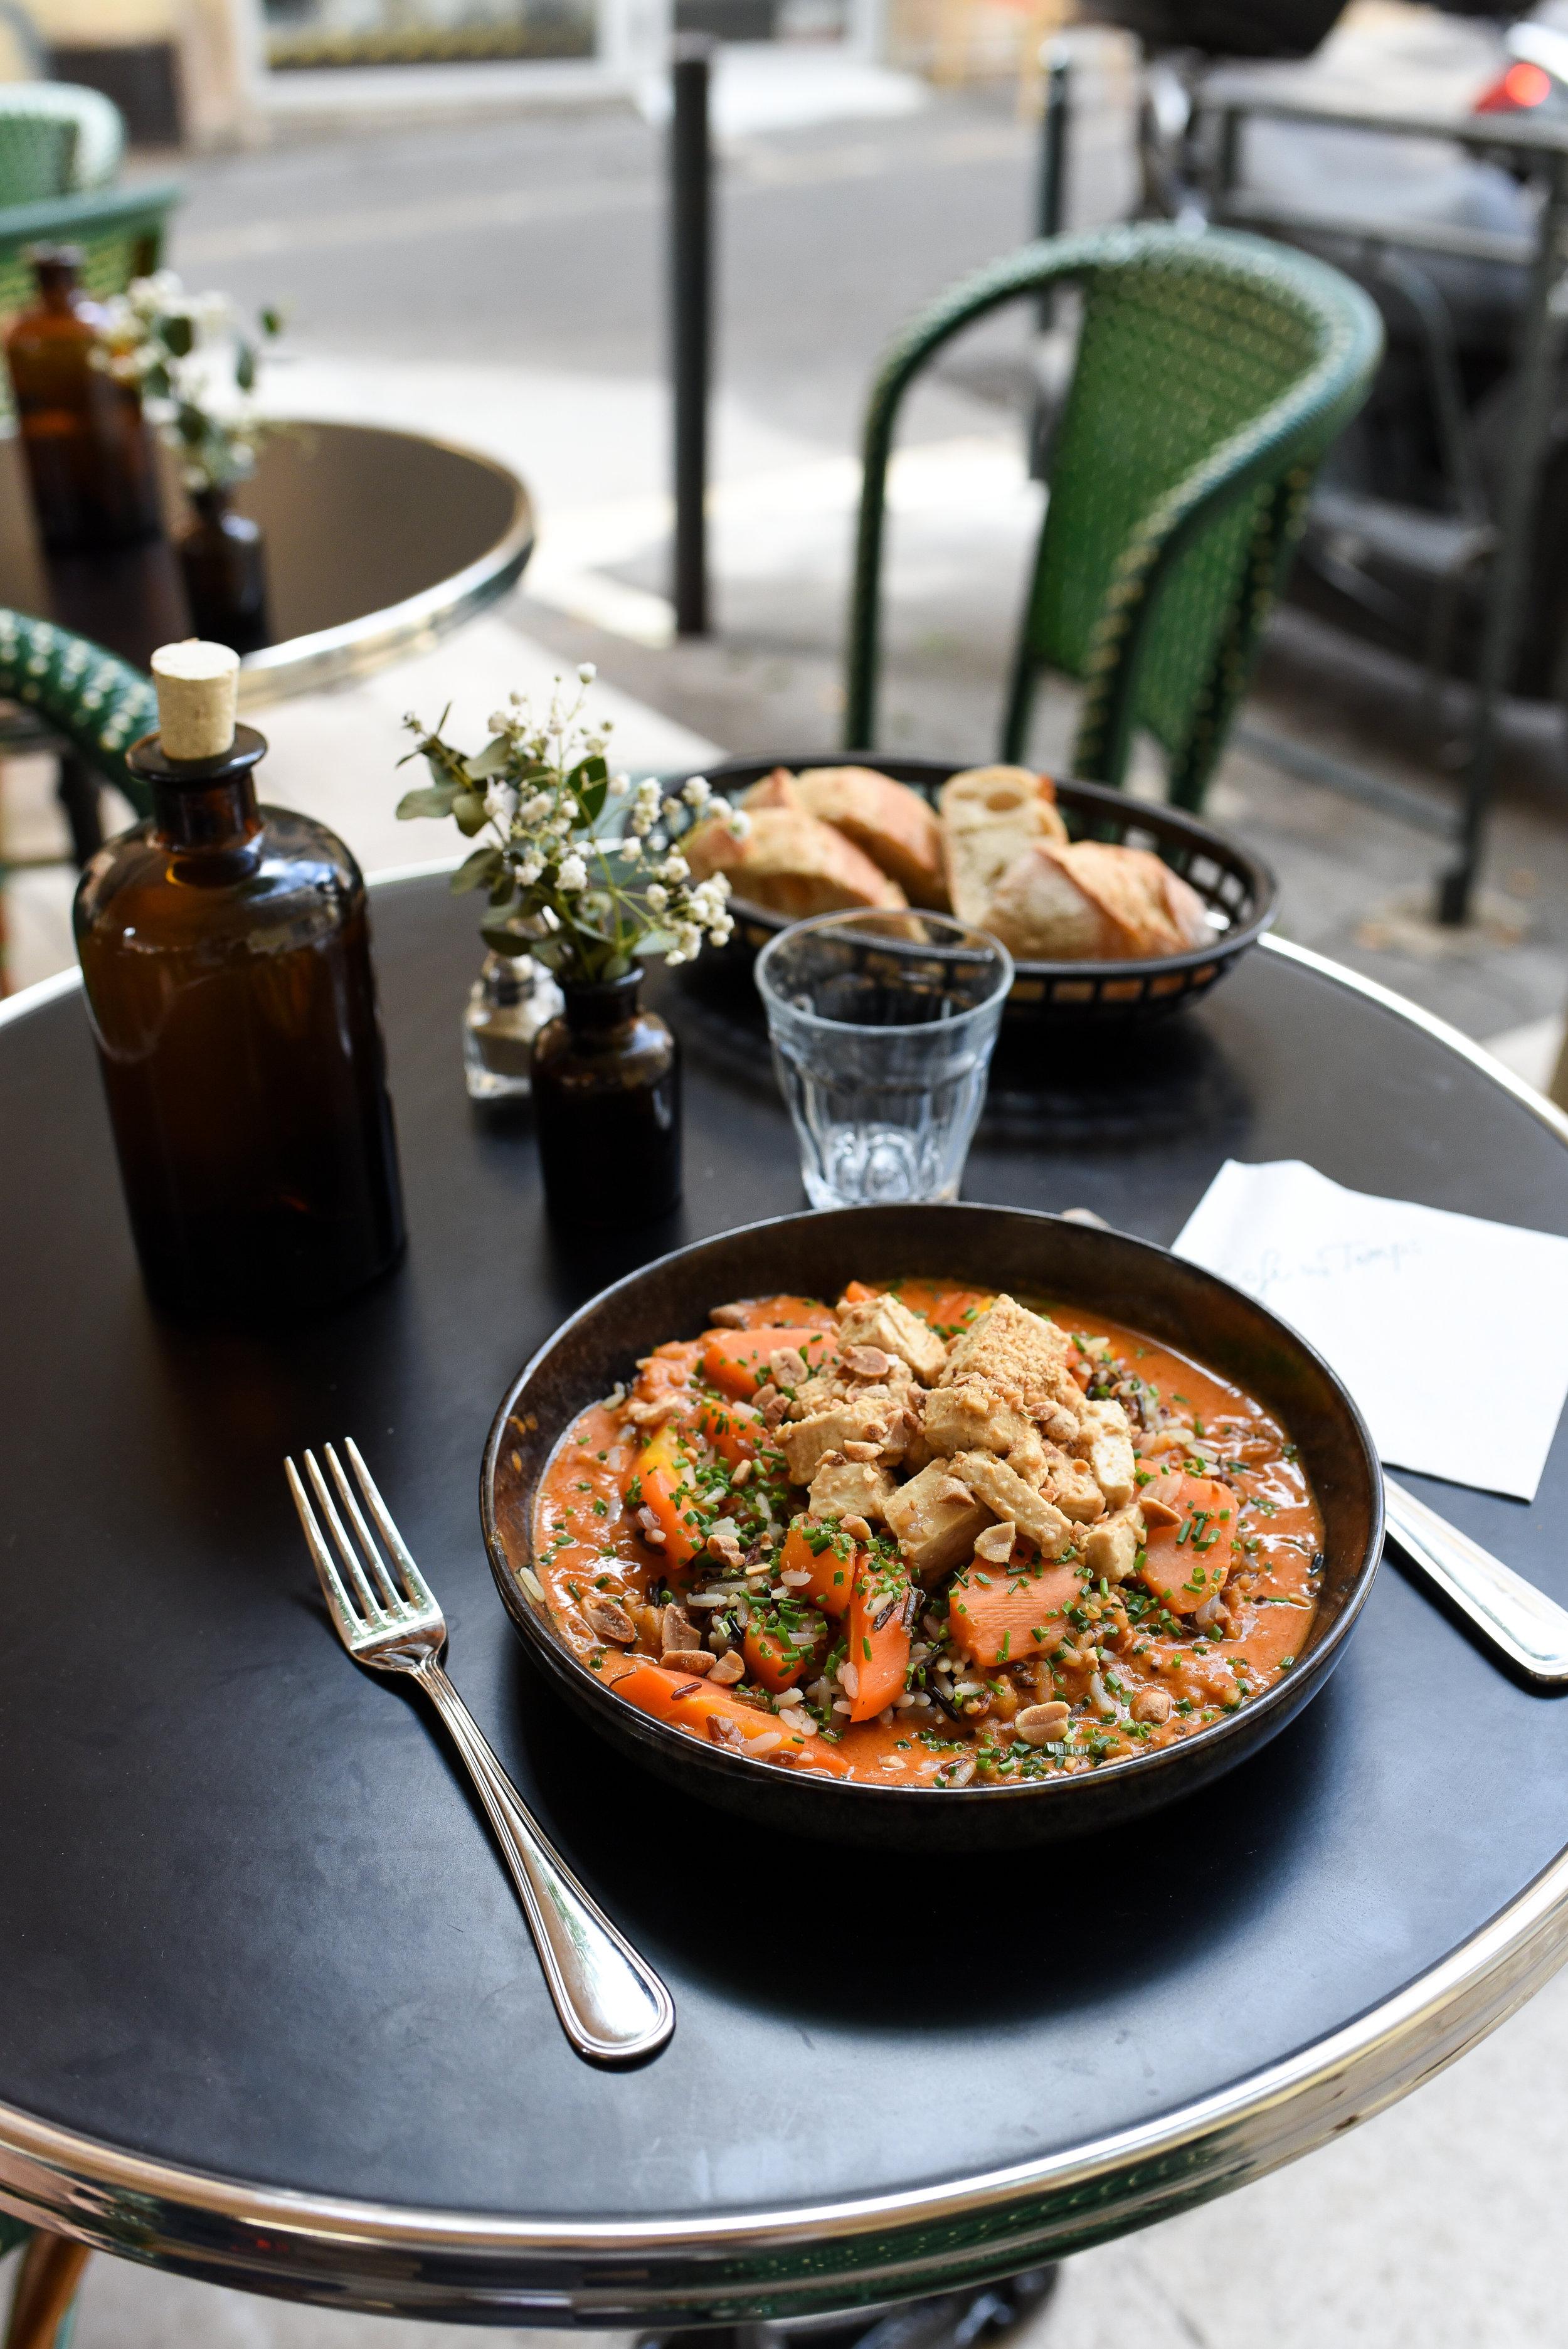 twinky-lizzy-blog-aix-en-provence-cafe-du-temps-restaurant-vegan-11.jpg